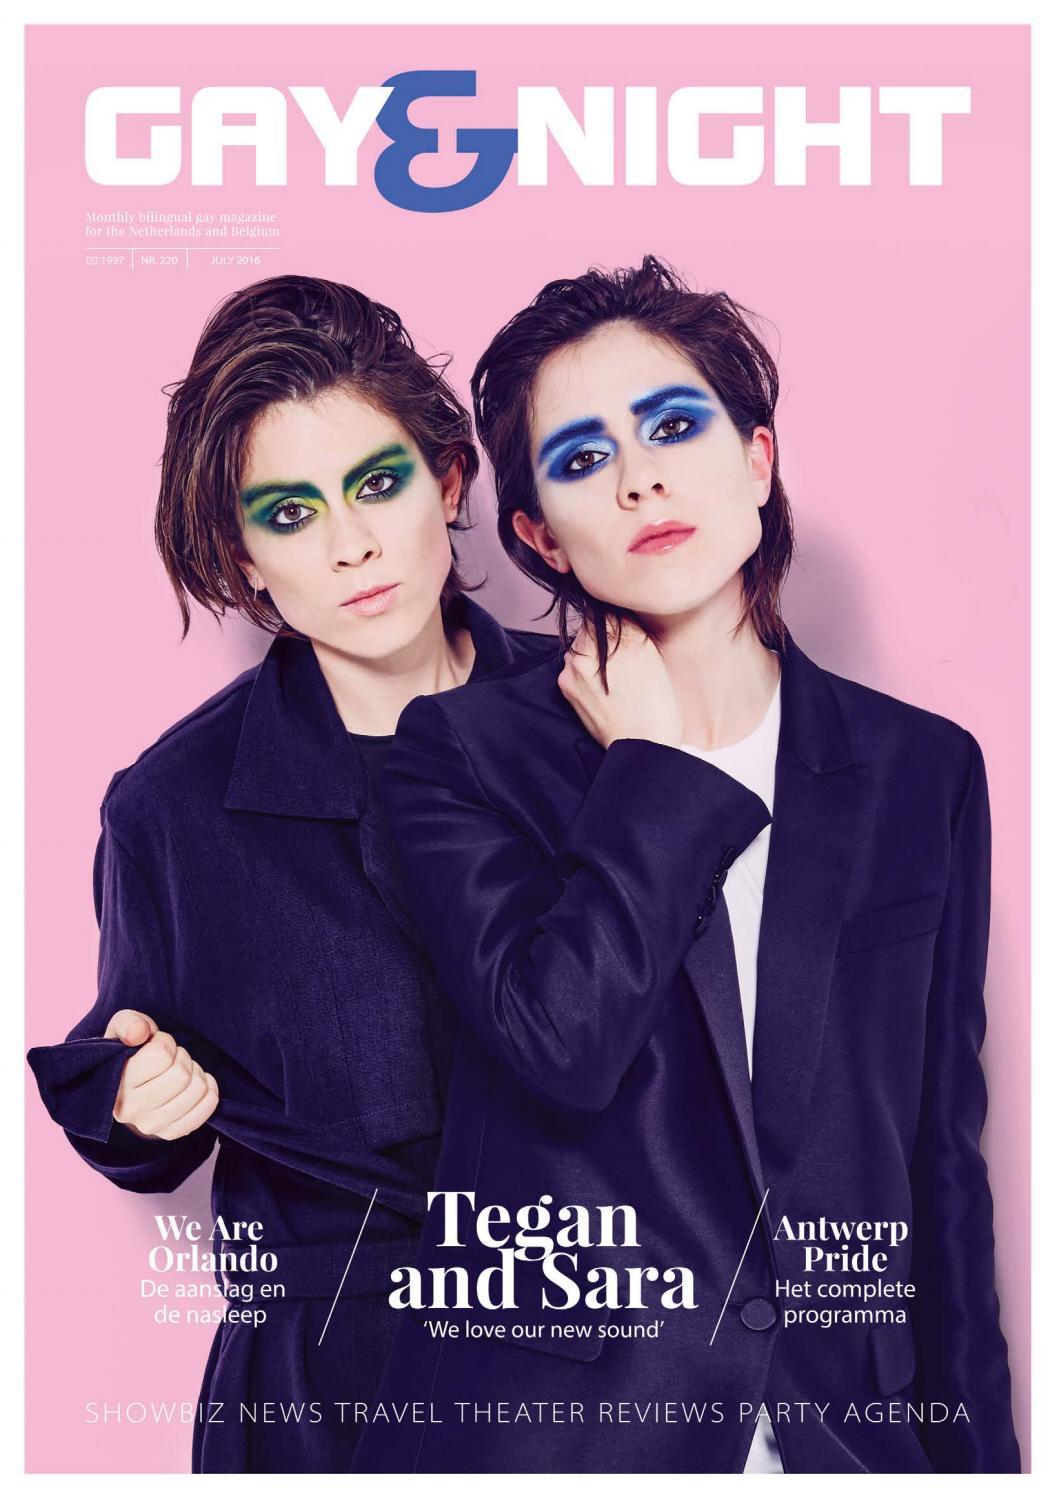 Gay&night zizo juli 2013 by gay&night magazine   issuu